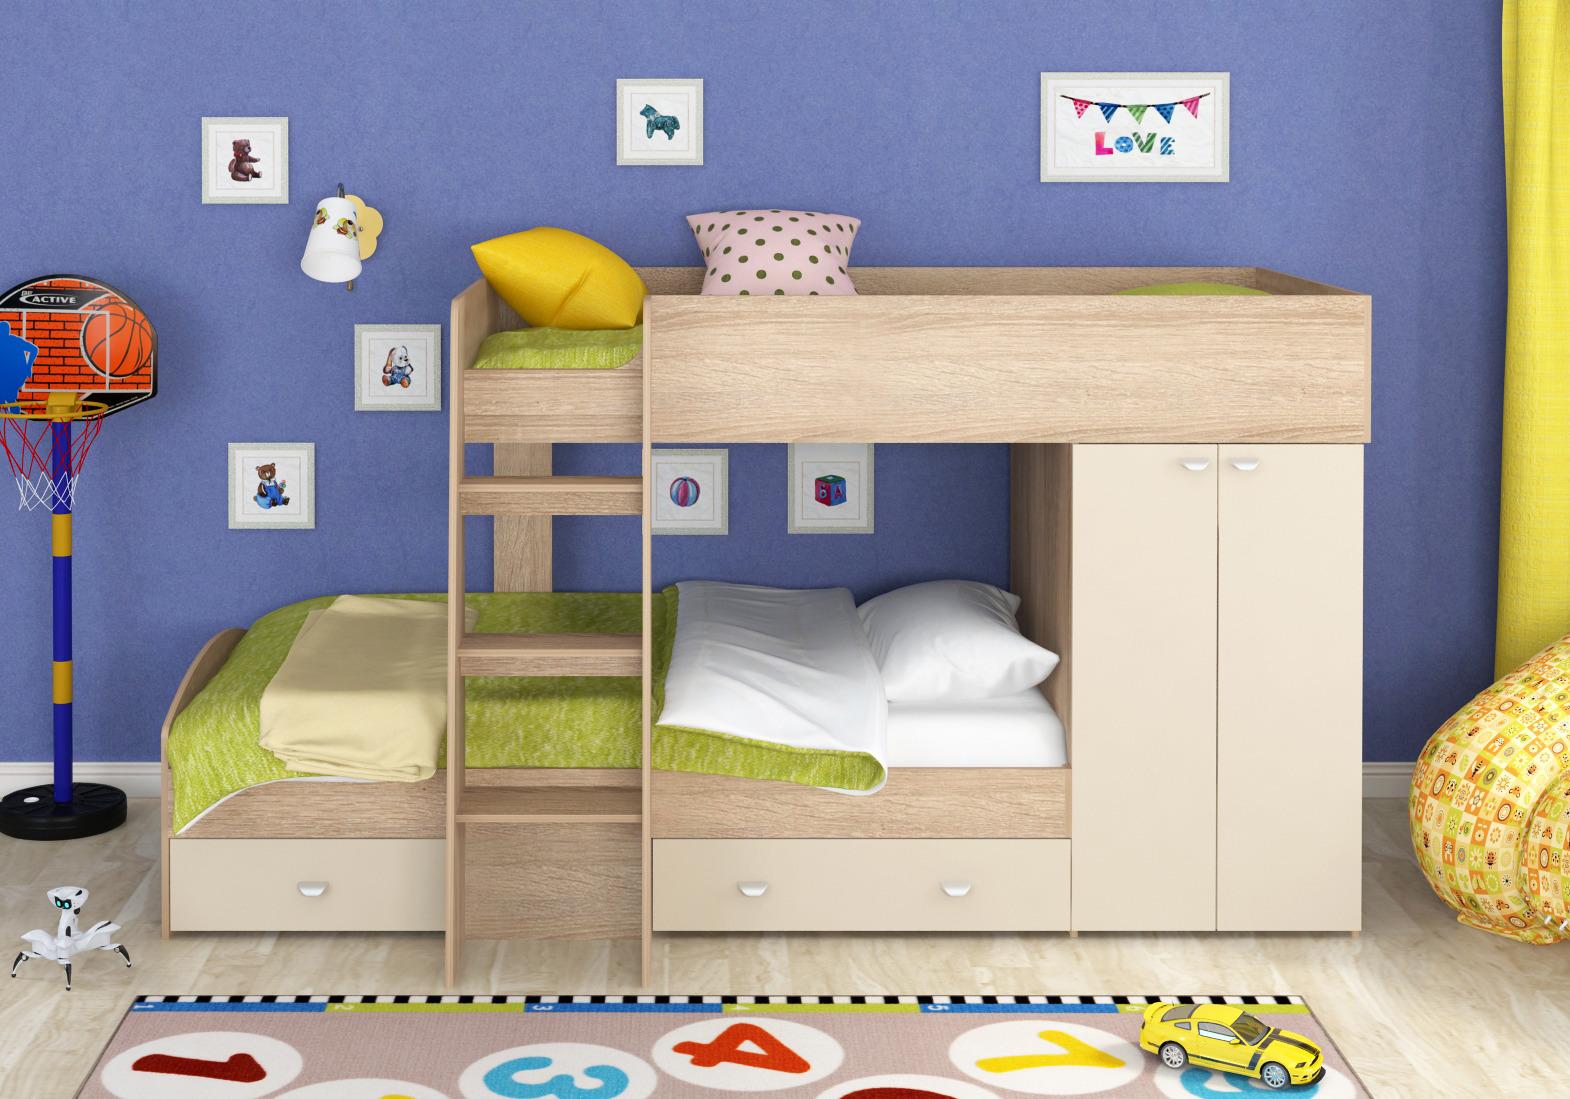 Набор мебели Golden Kids 2 кдКровати двухъярусные<br><br><br>Длина мм: 1265<br>Высота мм: 1555<br>Глубина мм: 2700